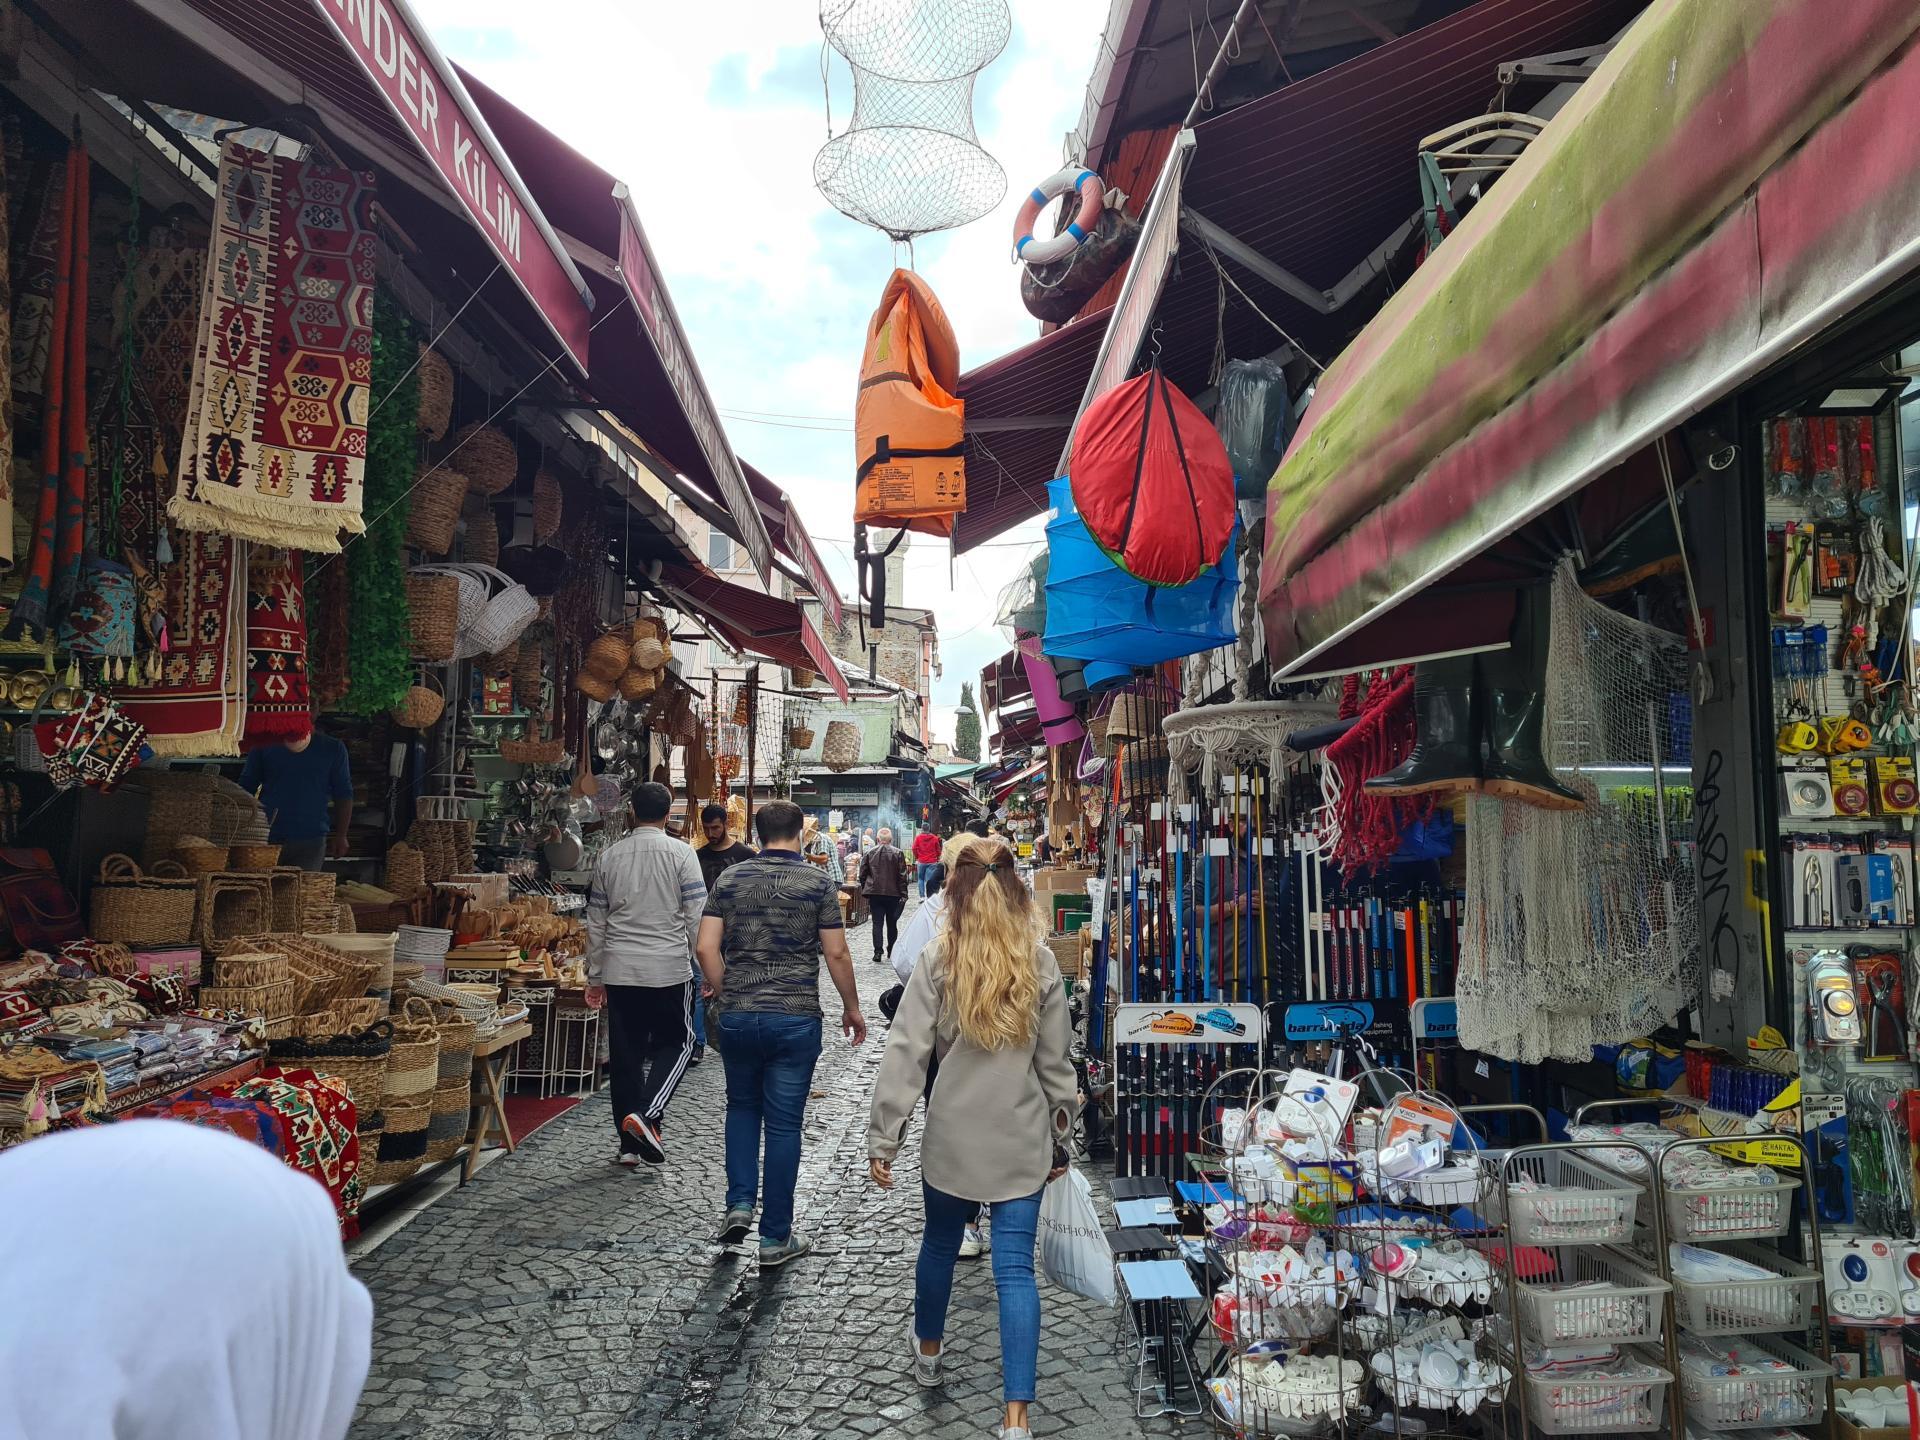 на подходе к Гранд-Базару в Стамбуле